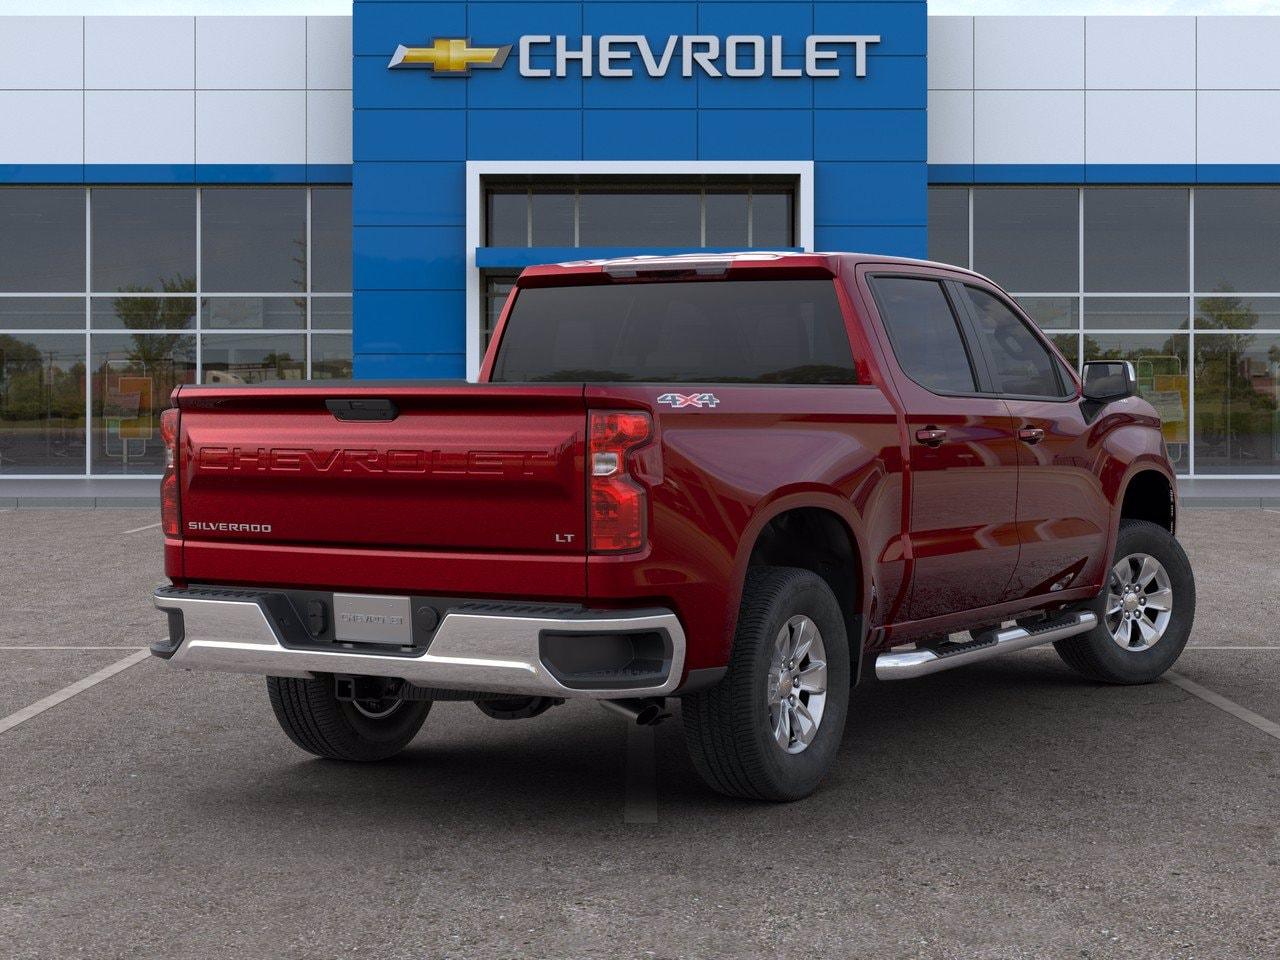 2020 Chevrolet Silverado 1500 Crew Cab 4x4, Pickup #C201723 - photo 1